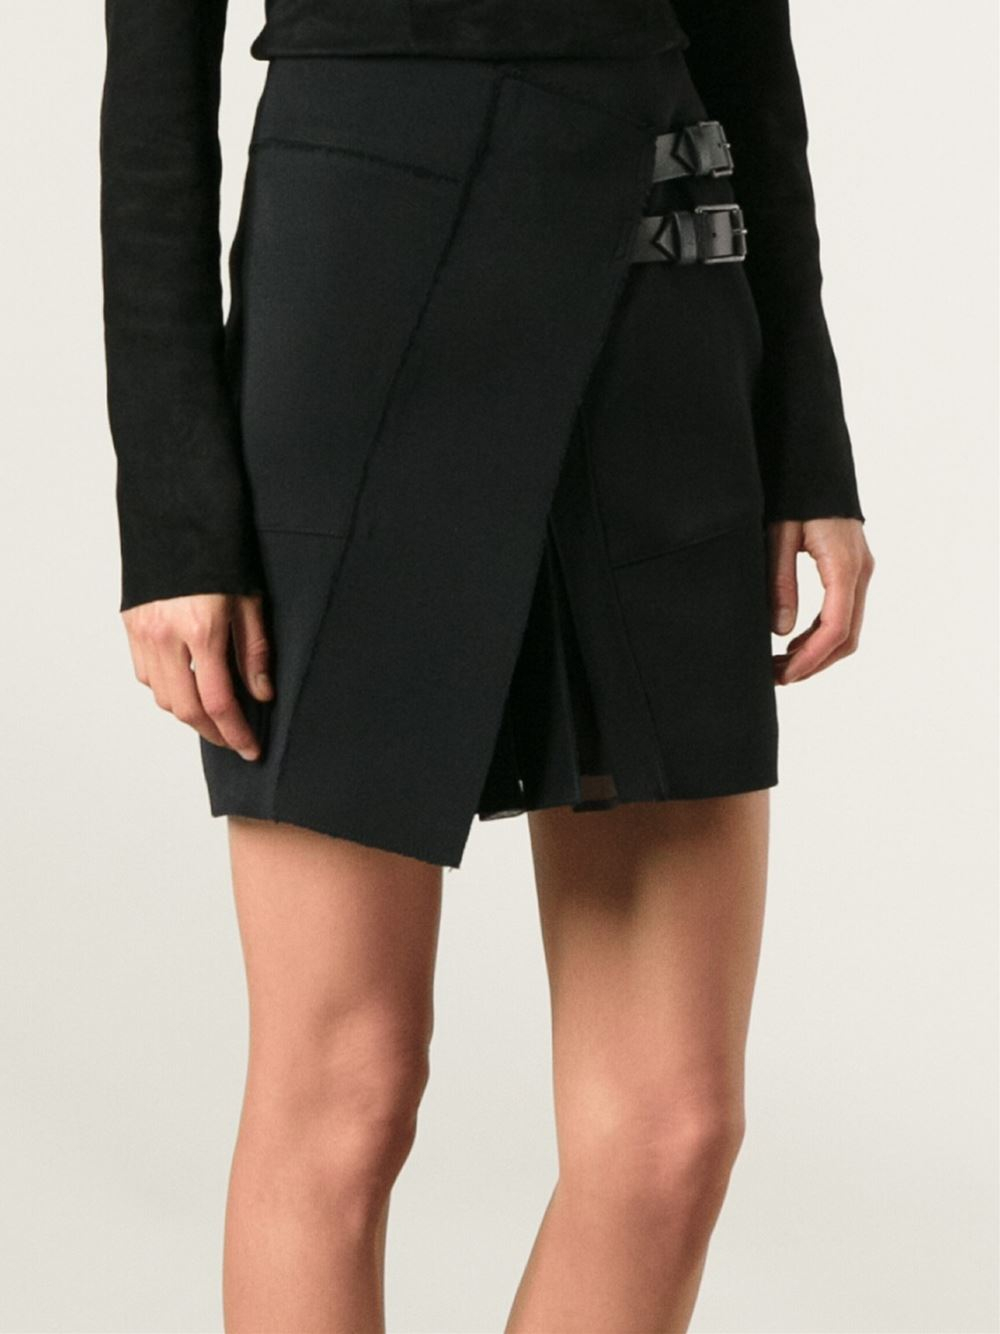 Bonne salope wrap skirt black